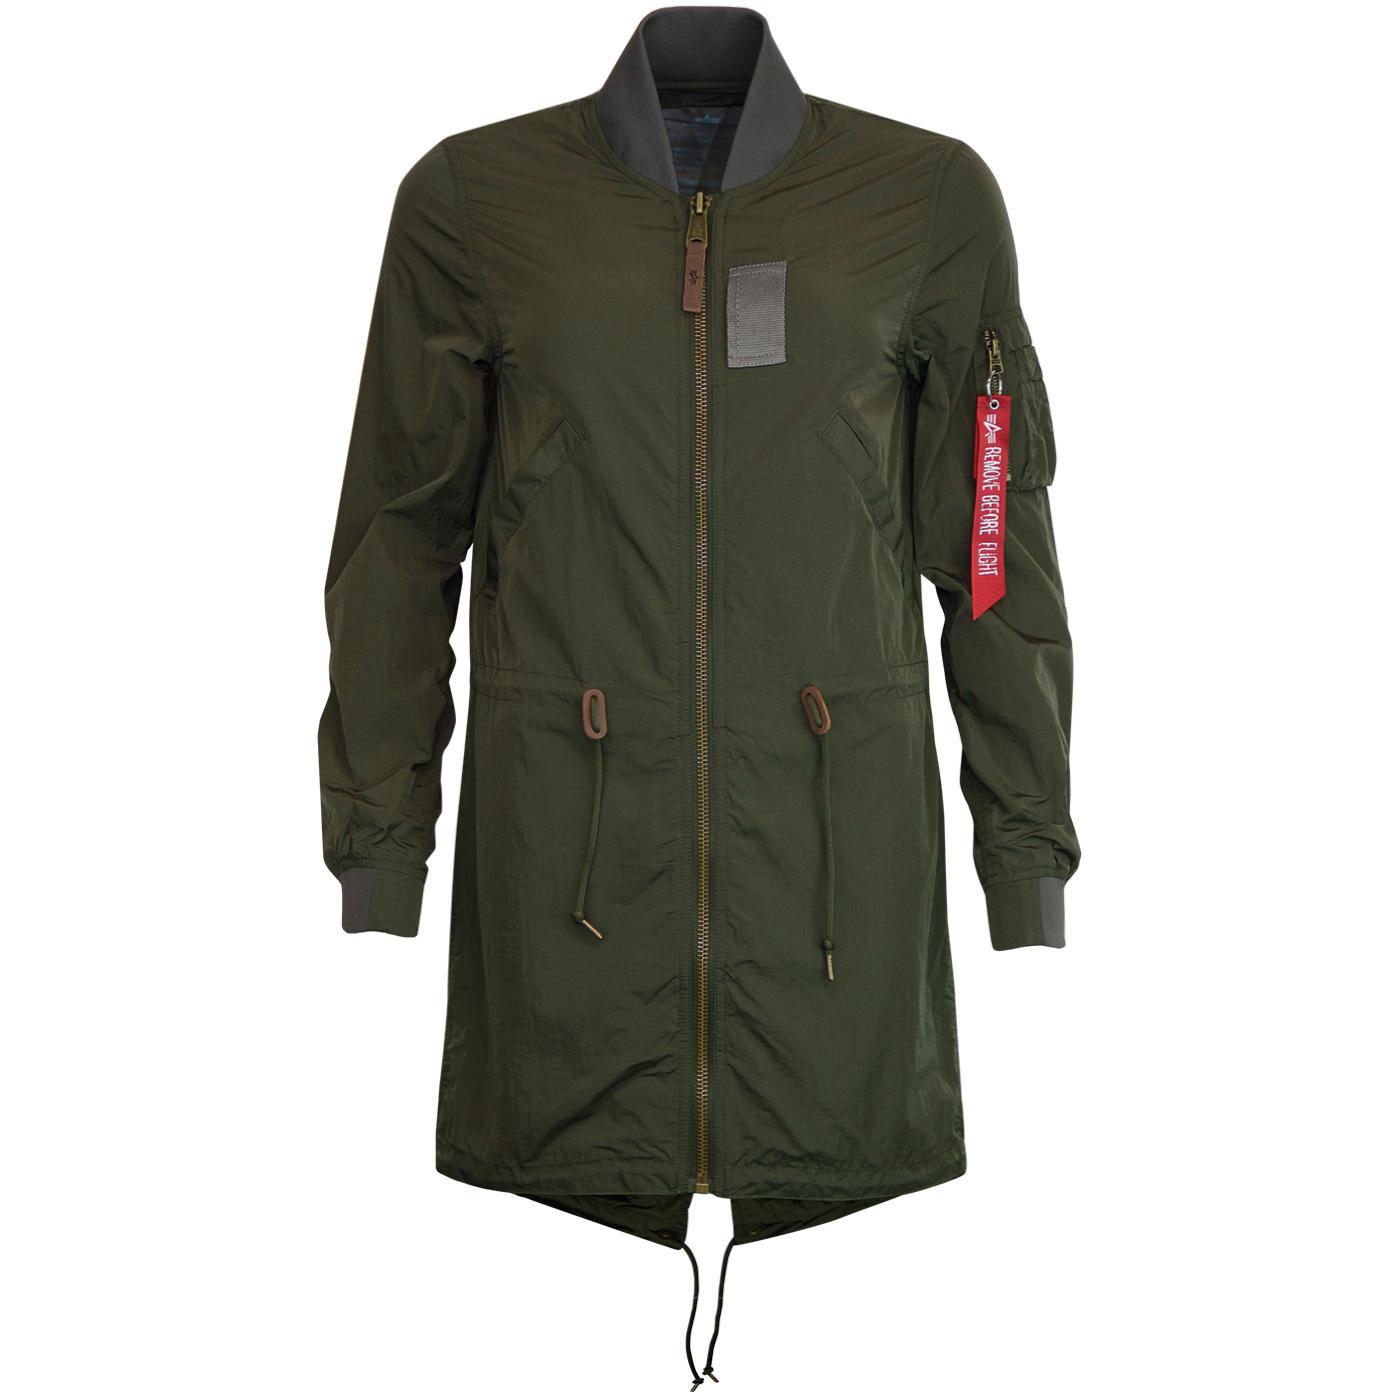 ALPHA INDUSTRIES Women's Fishtail Bomber Jacket